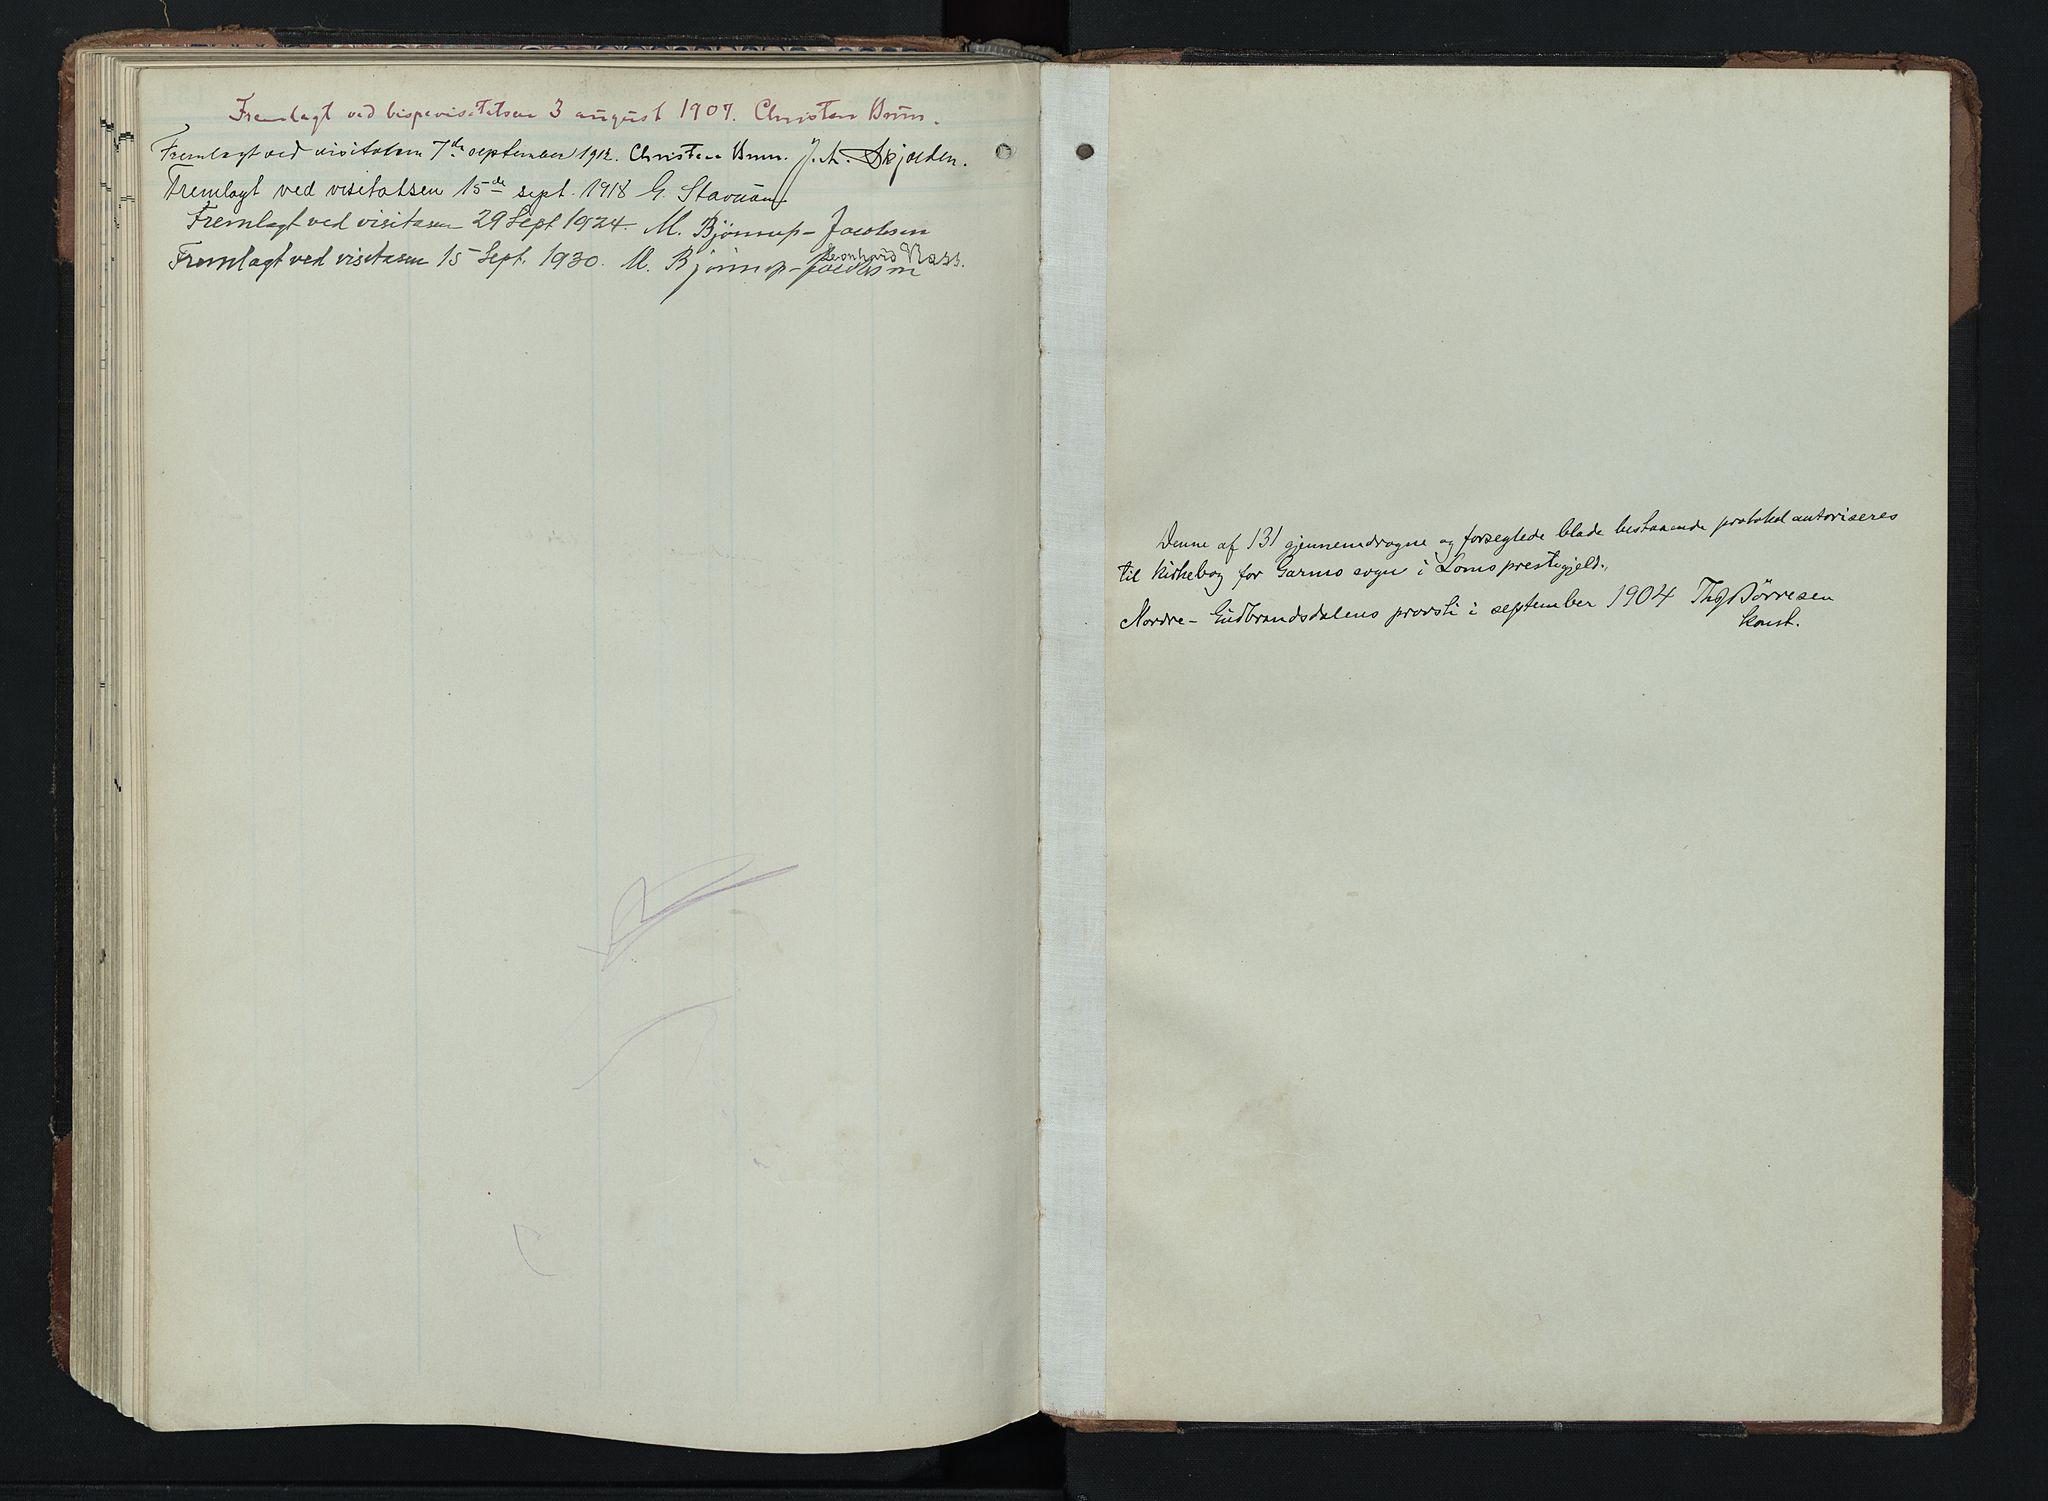 SAH, Lom prestekontor, K/L0011: Ministerialbok nr. 11, 1904-1928